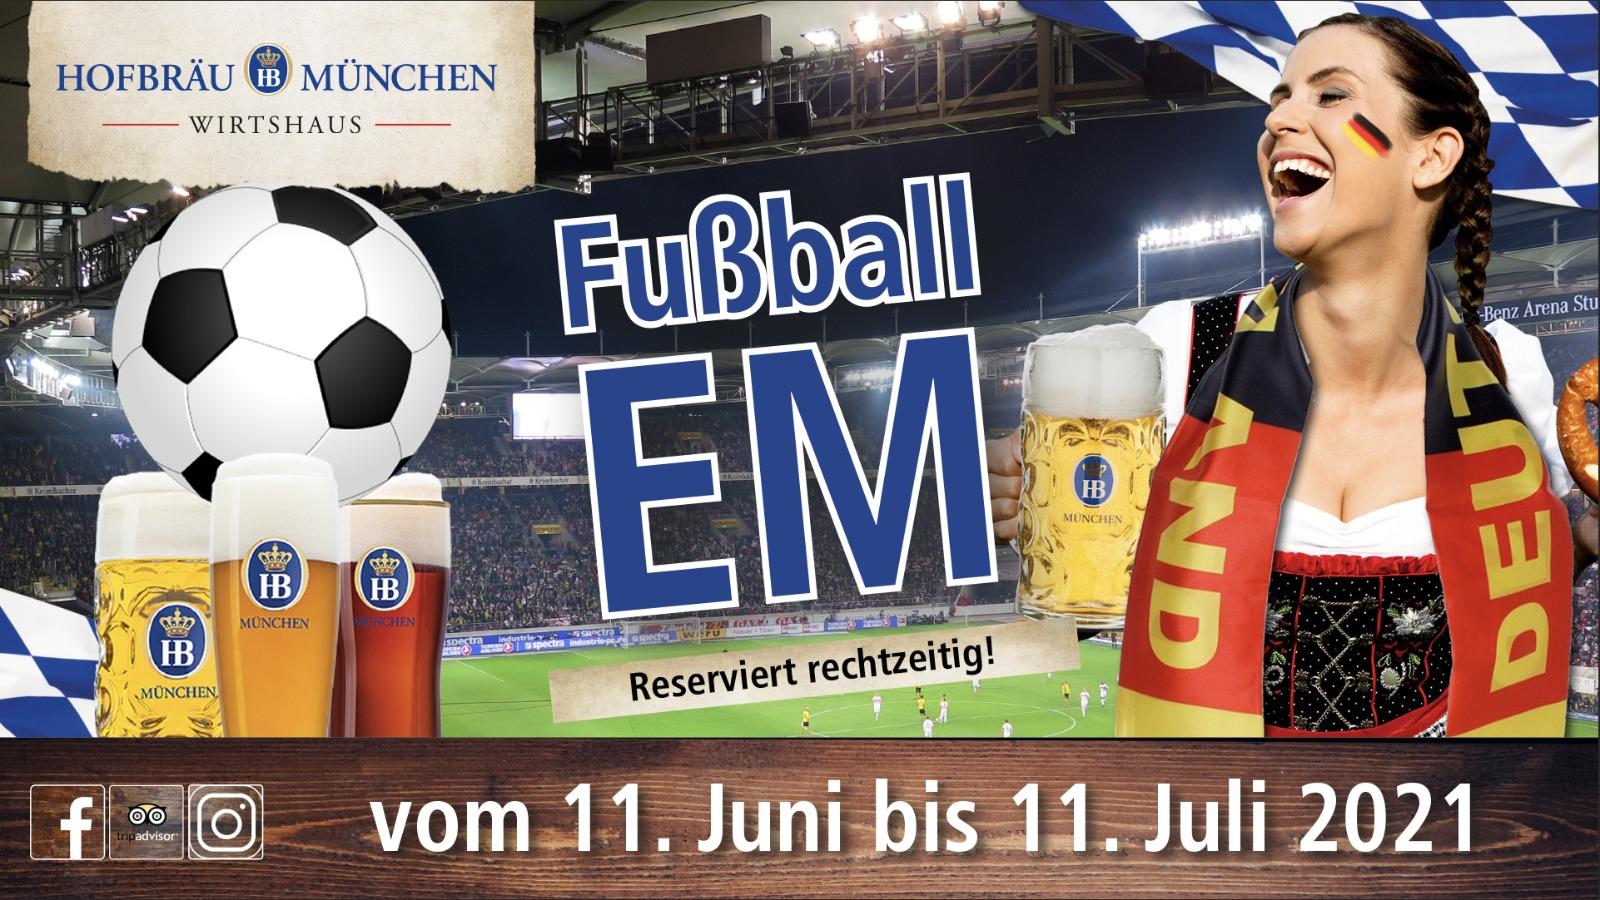 Fussball EM 2021 in Berlin